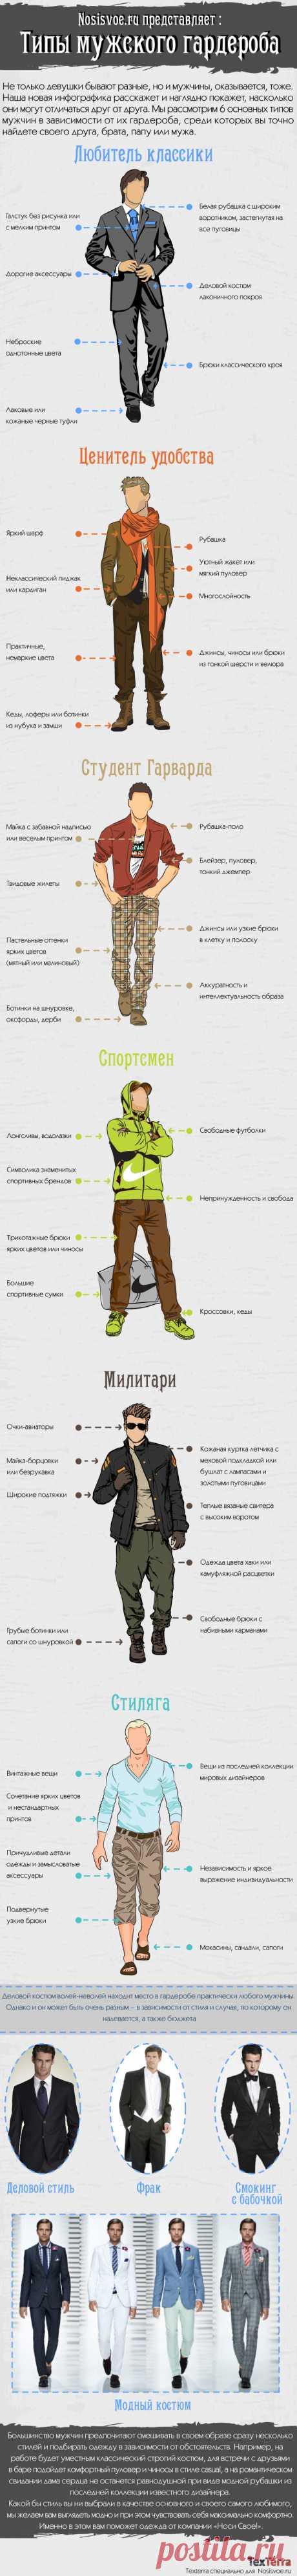 Типы мужского гардероба